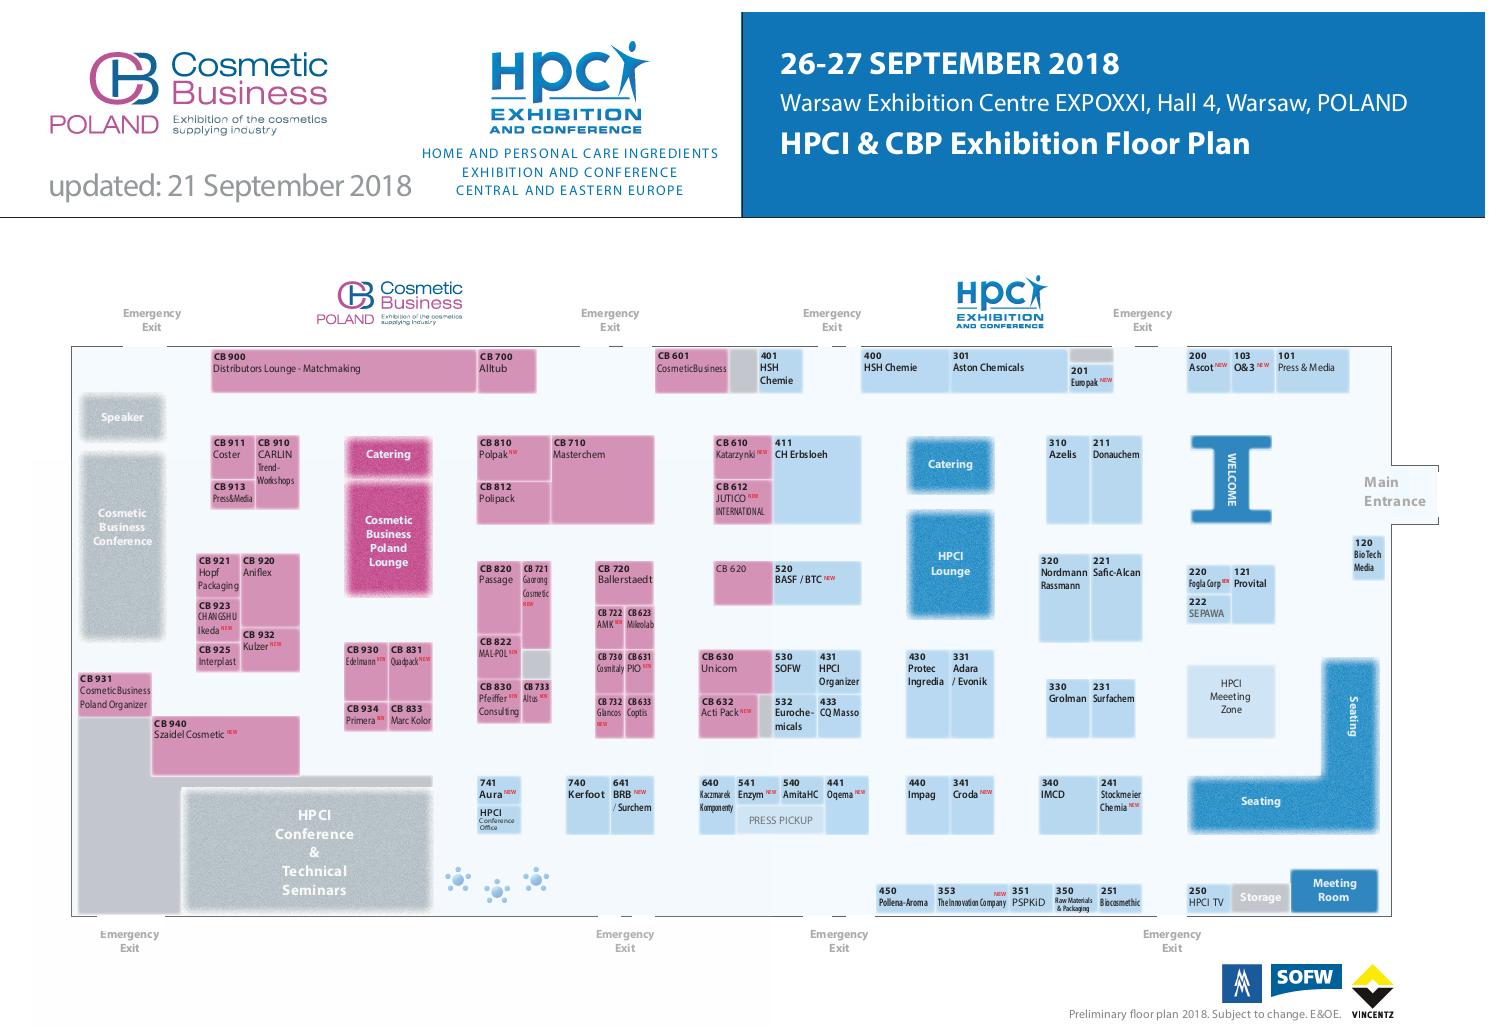 HPCI CEE Floorplan 2018